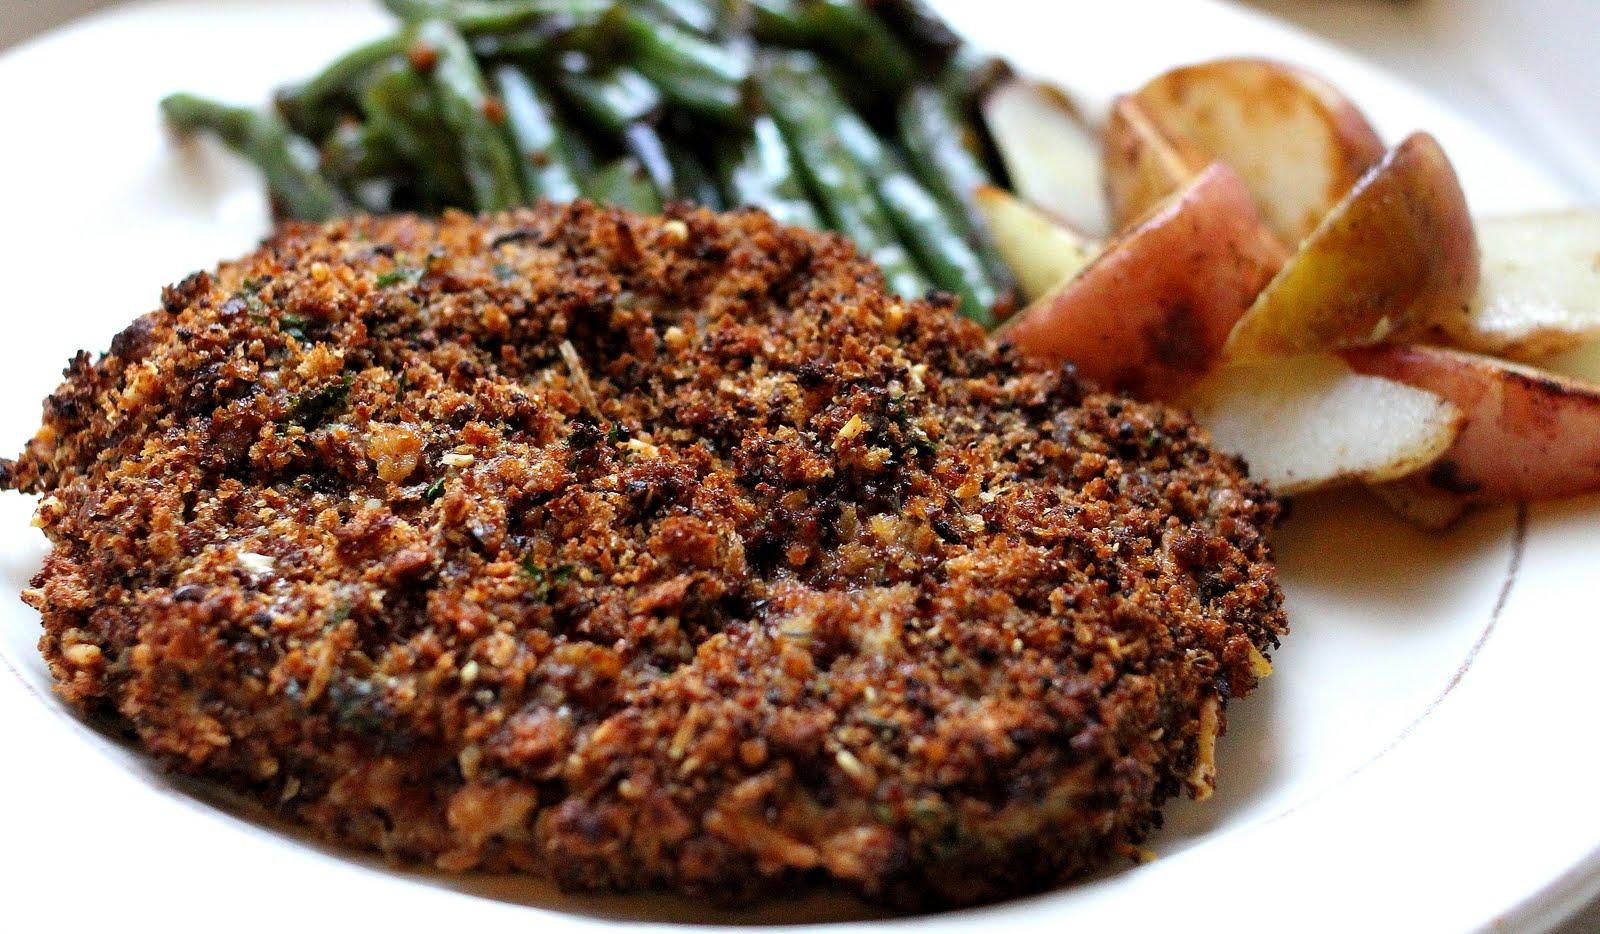 On My Menu: Crunchy Baked Pork Chops